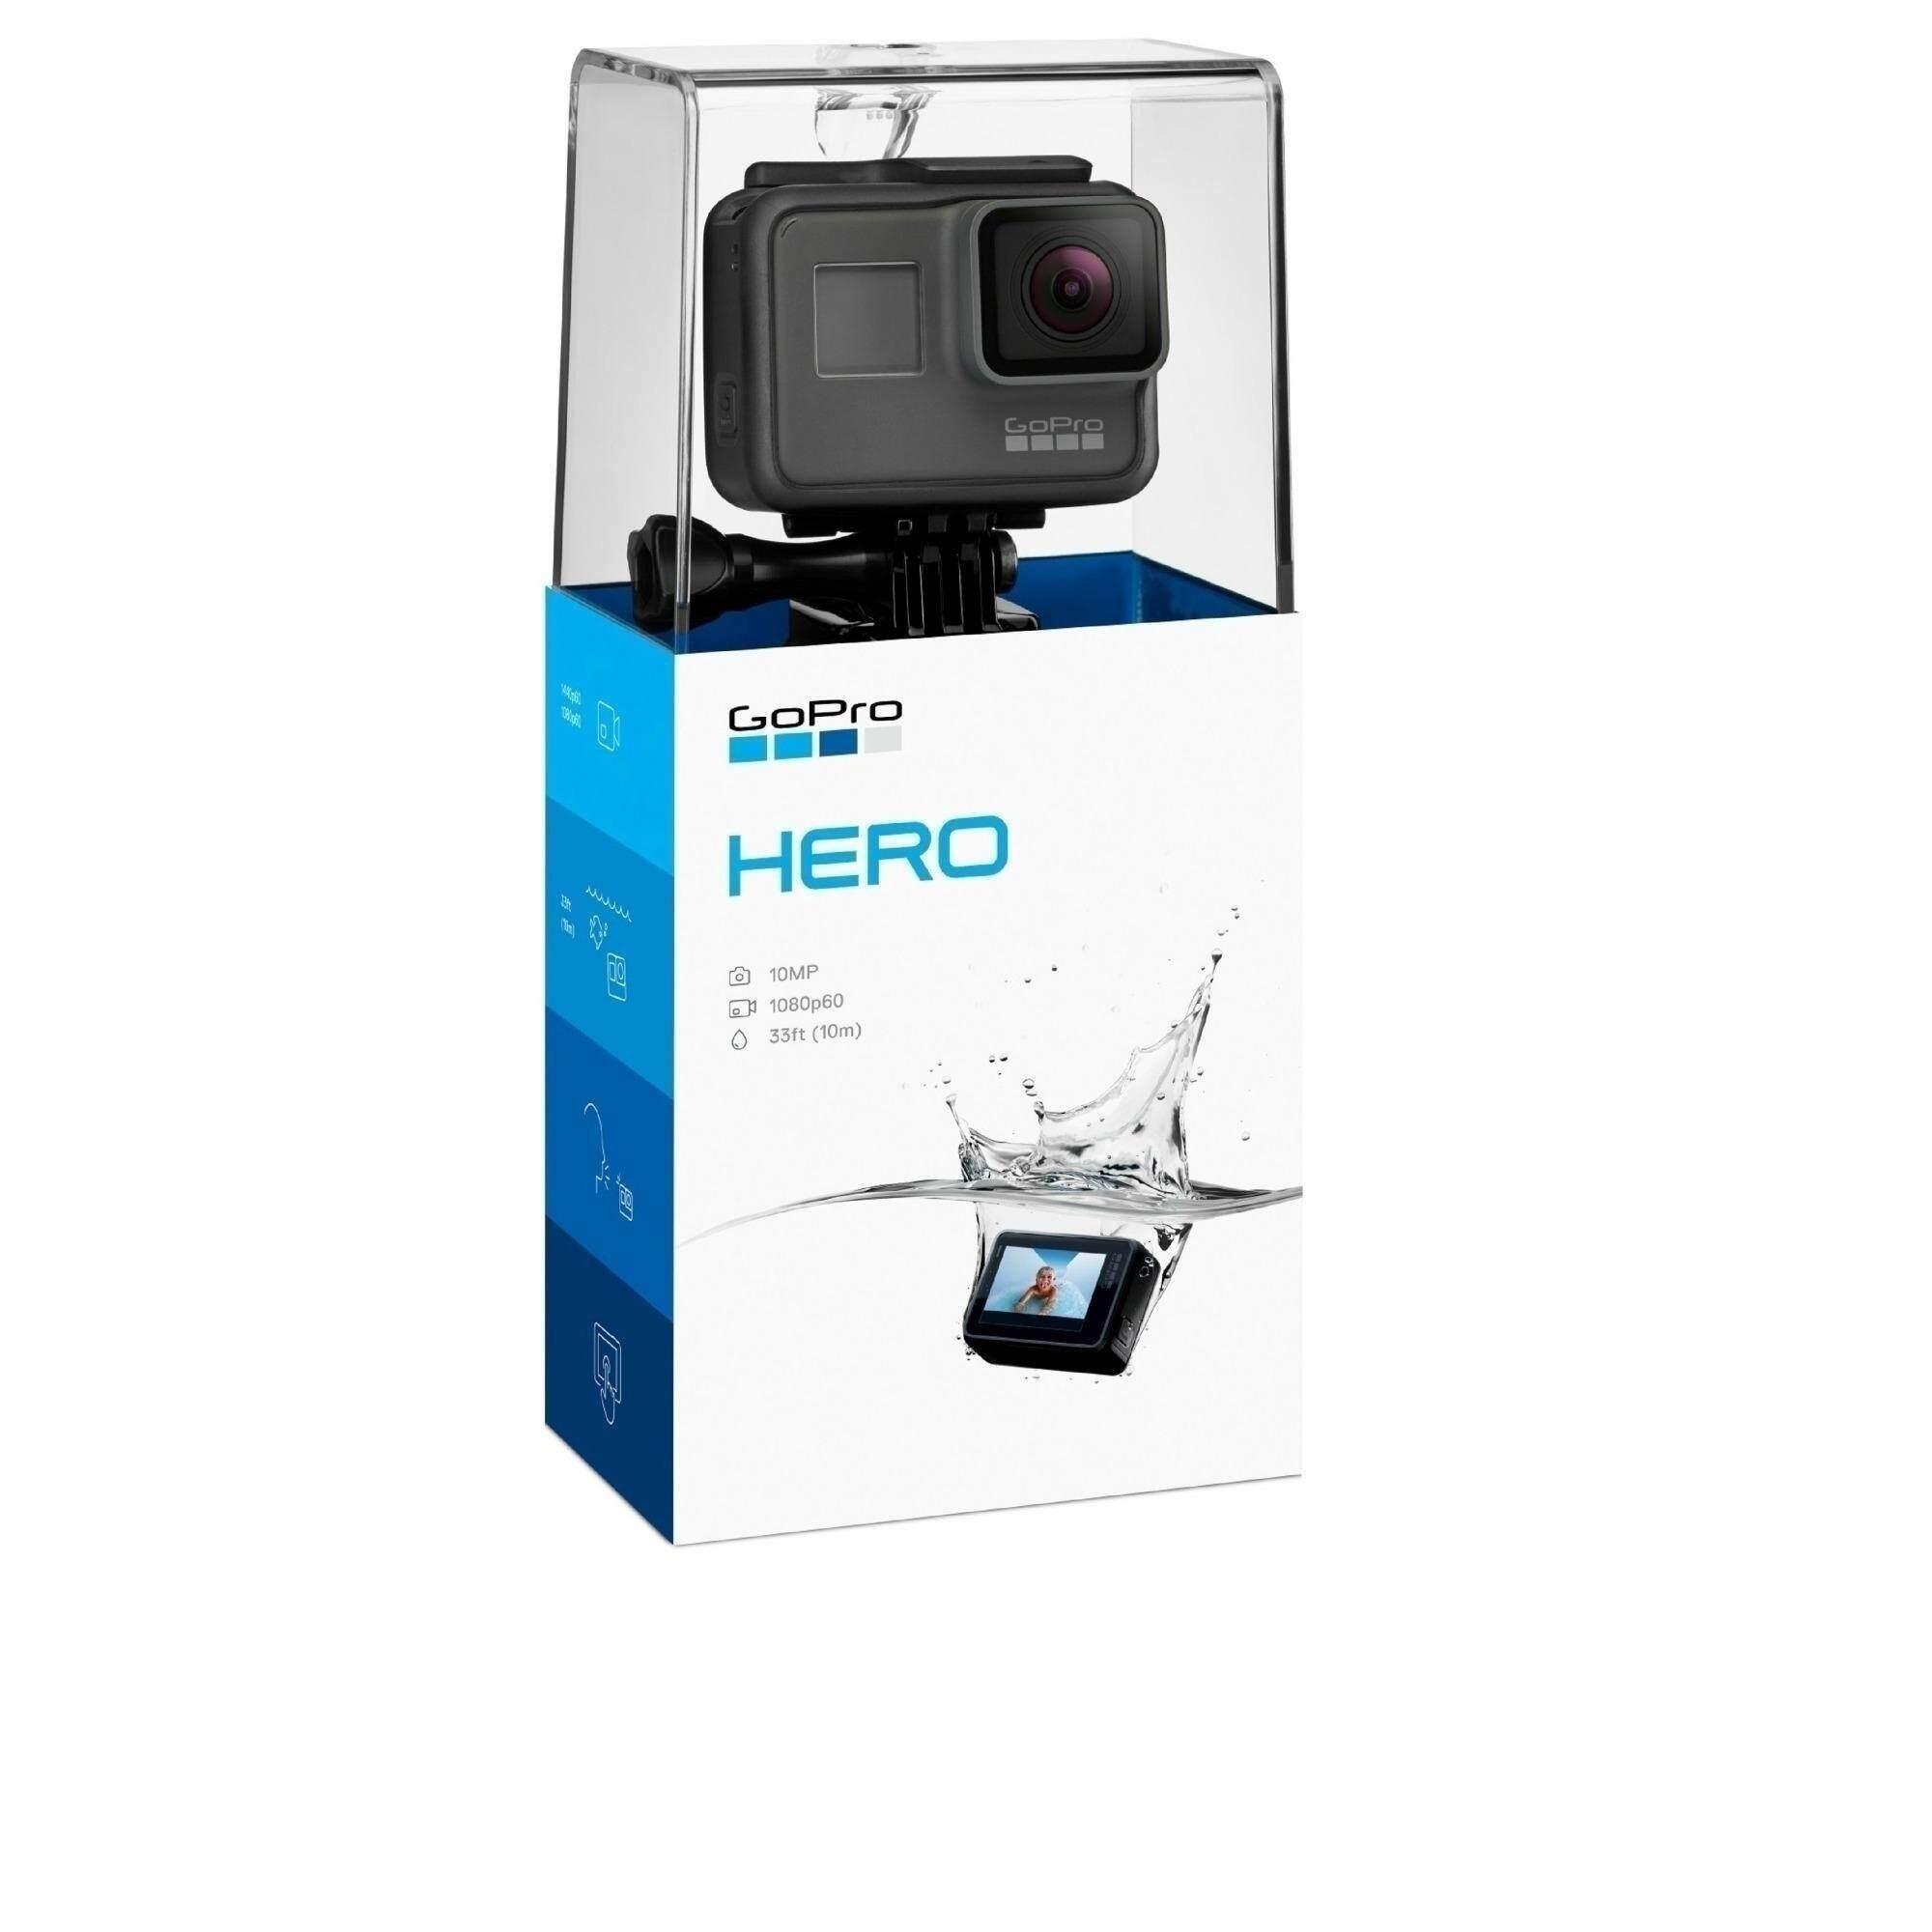 Sports Action Camera Buy At Best Price In Gopro Sportcam Non Wifi Kamera 4k Hero Official Warranty